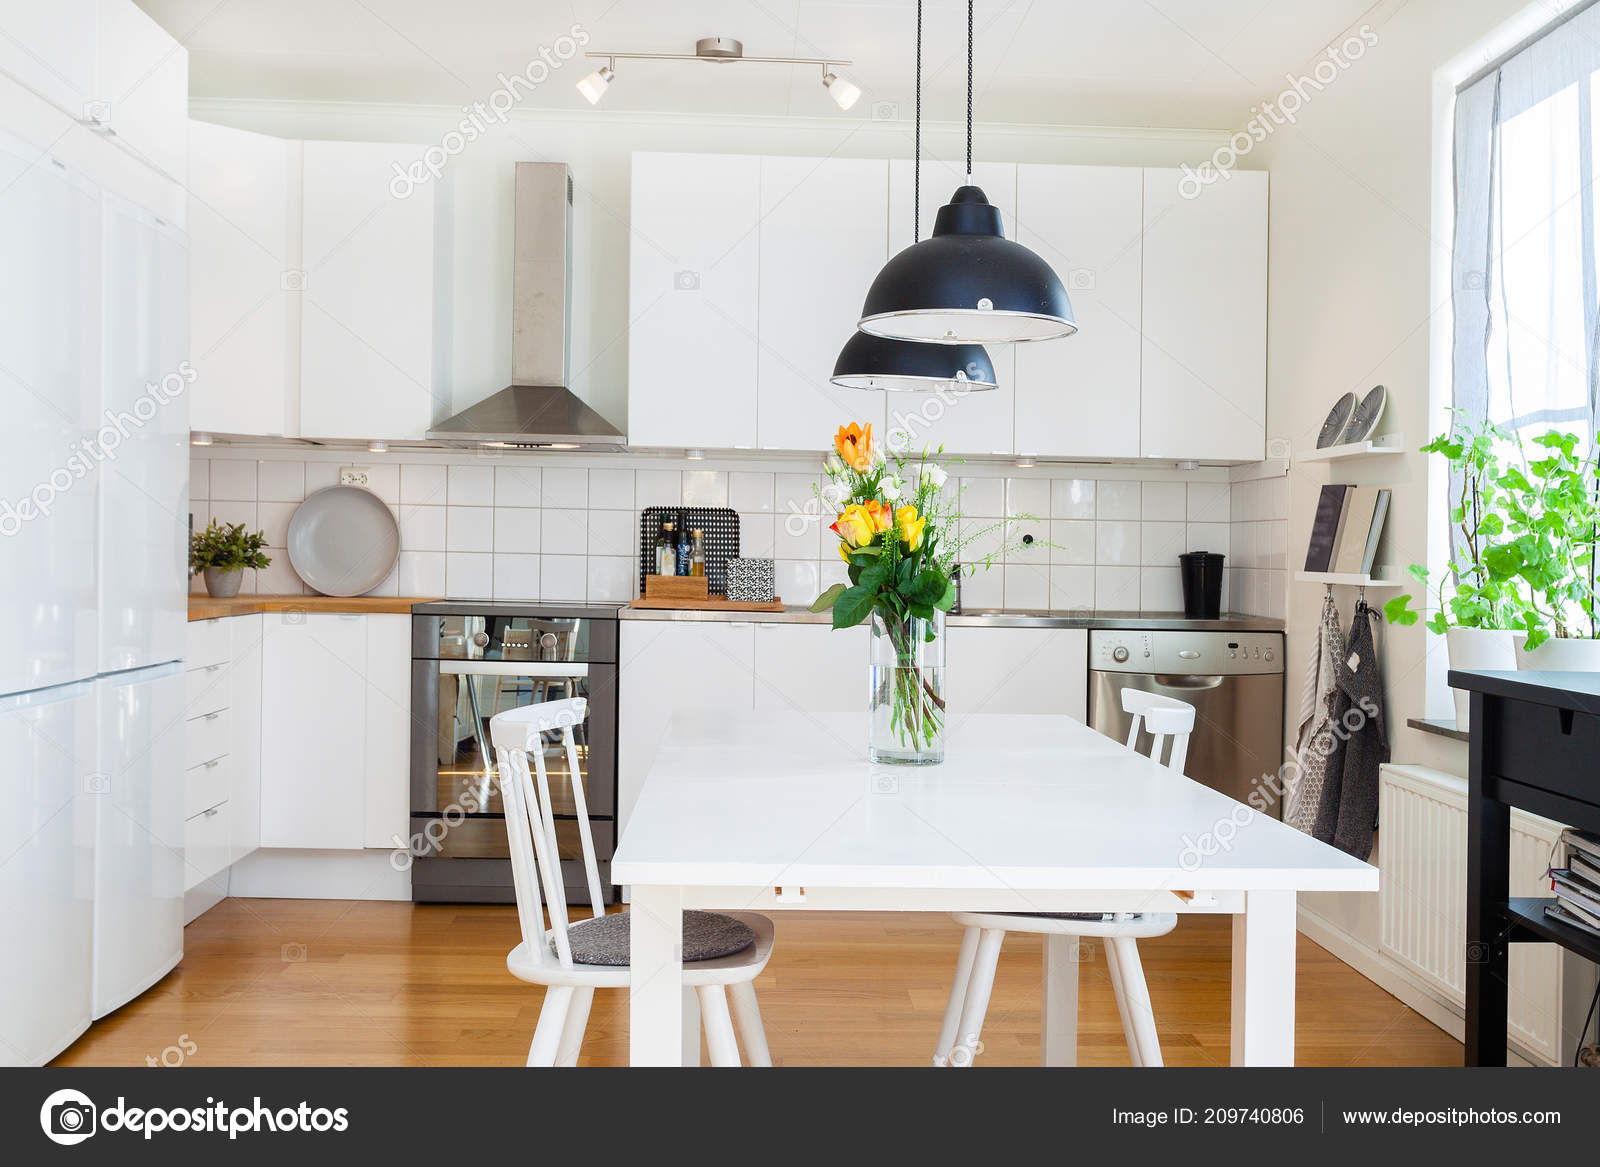 kitchen desk chair chairs walmart 厨房桌椅的高档厨房内饰 图库照片 c annaanderssonphotography 209740806